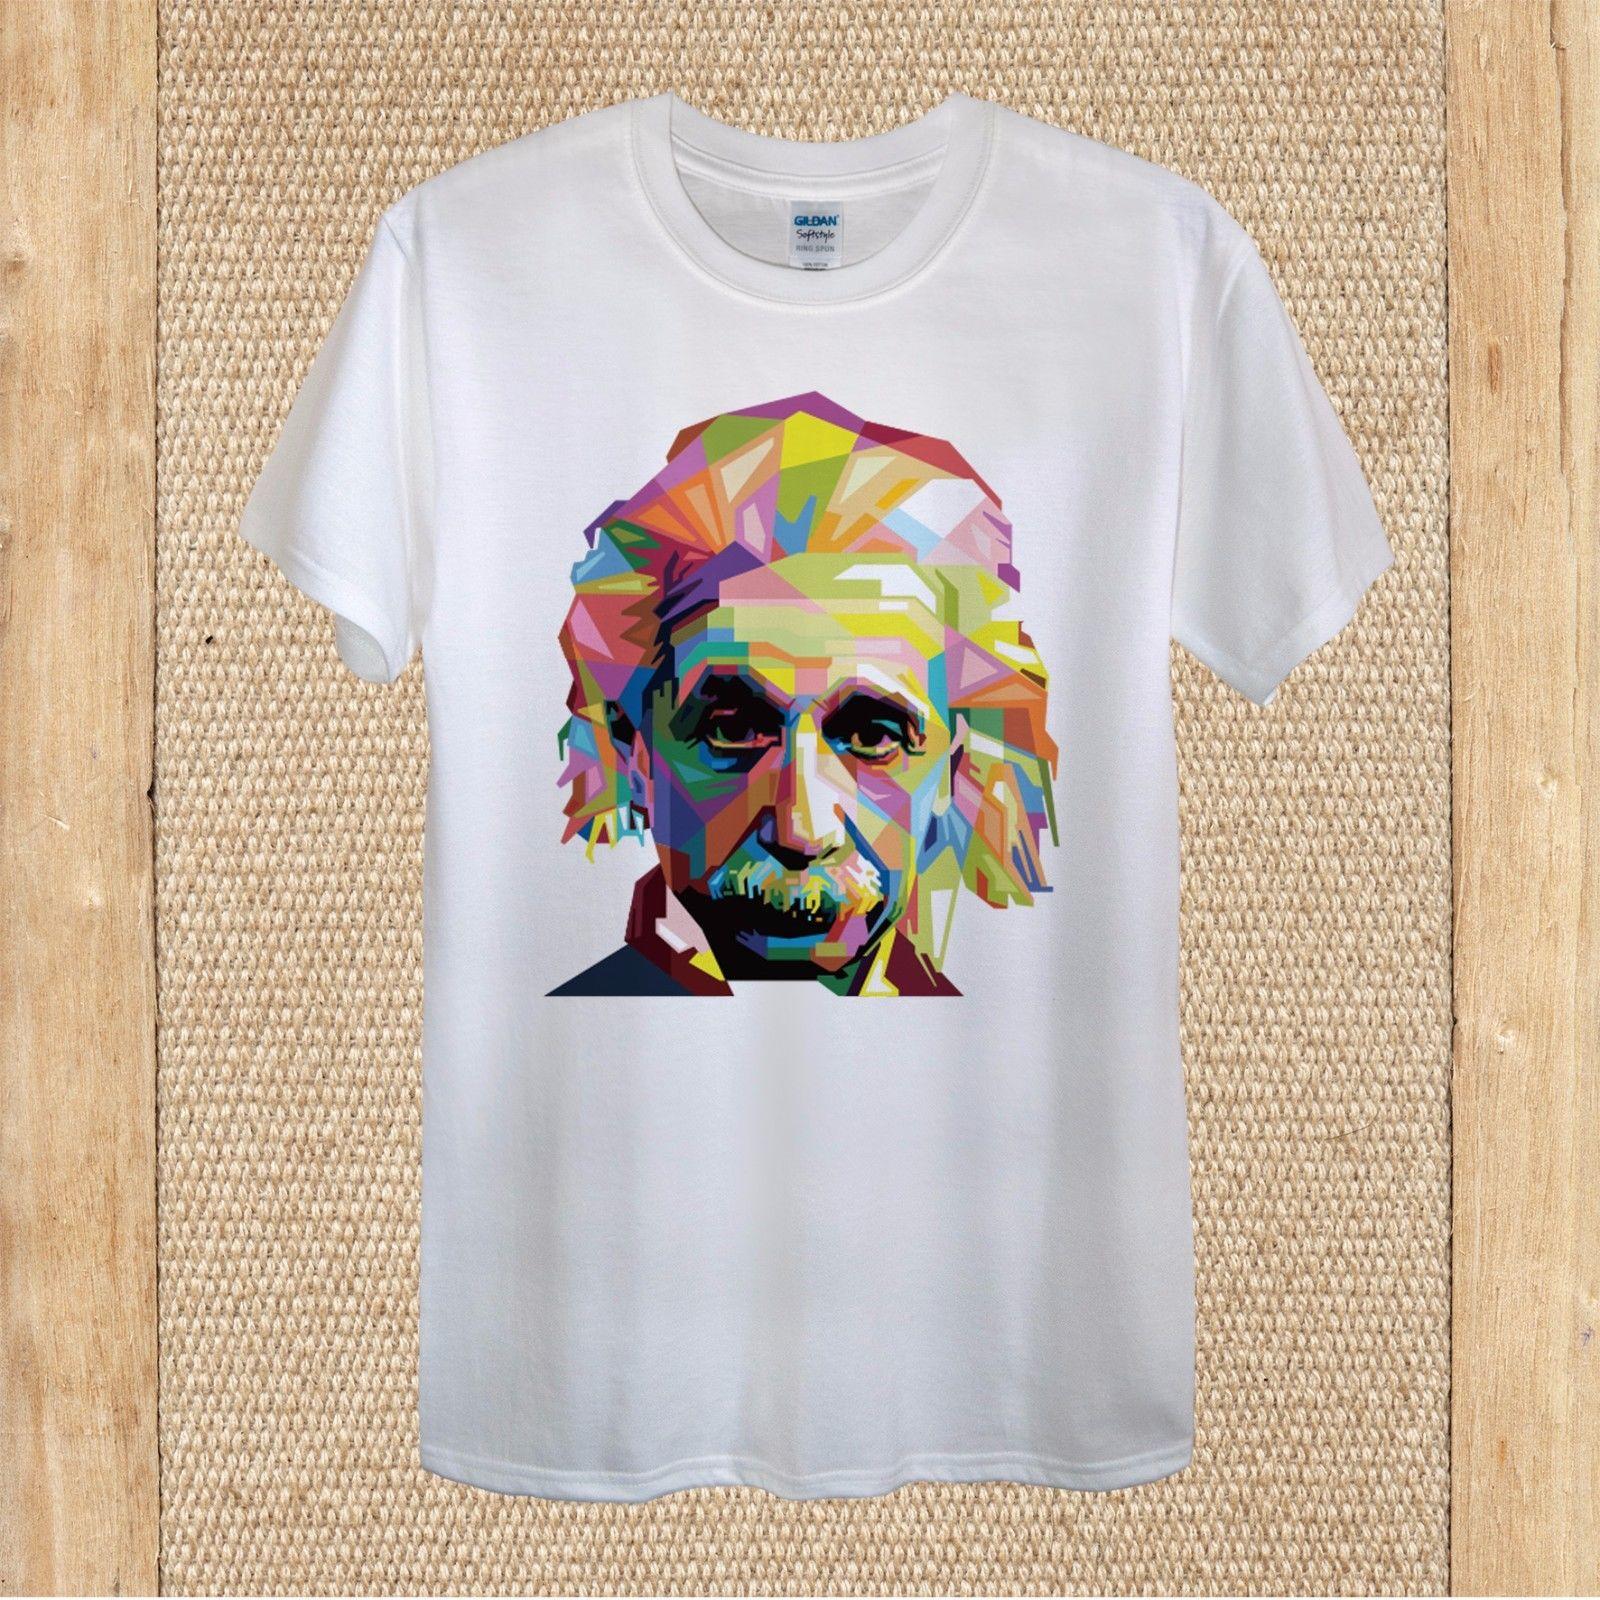 Albert Einstein Geometrical 100% Cotton unisex women Harajuku Tops t shirt Fashion Classic Unique free shipping